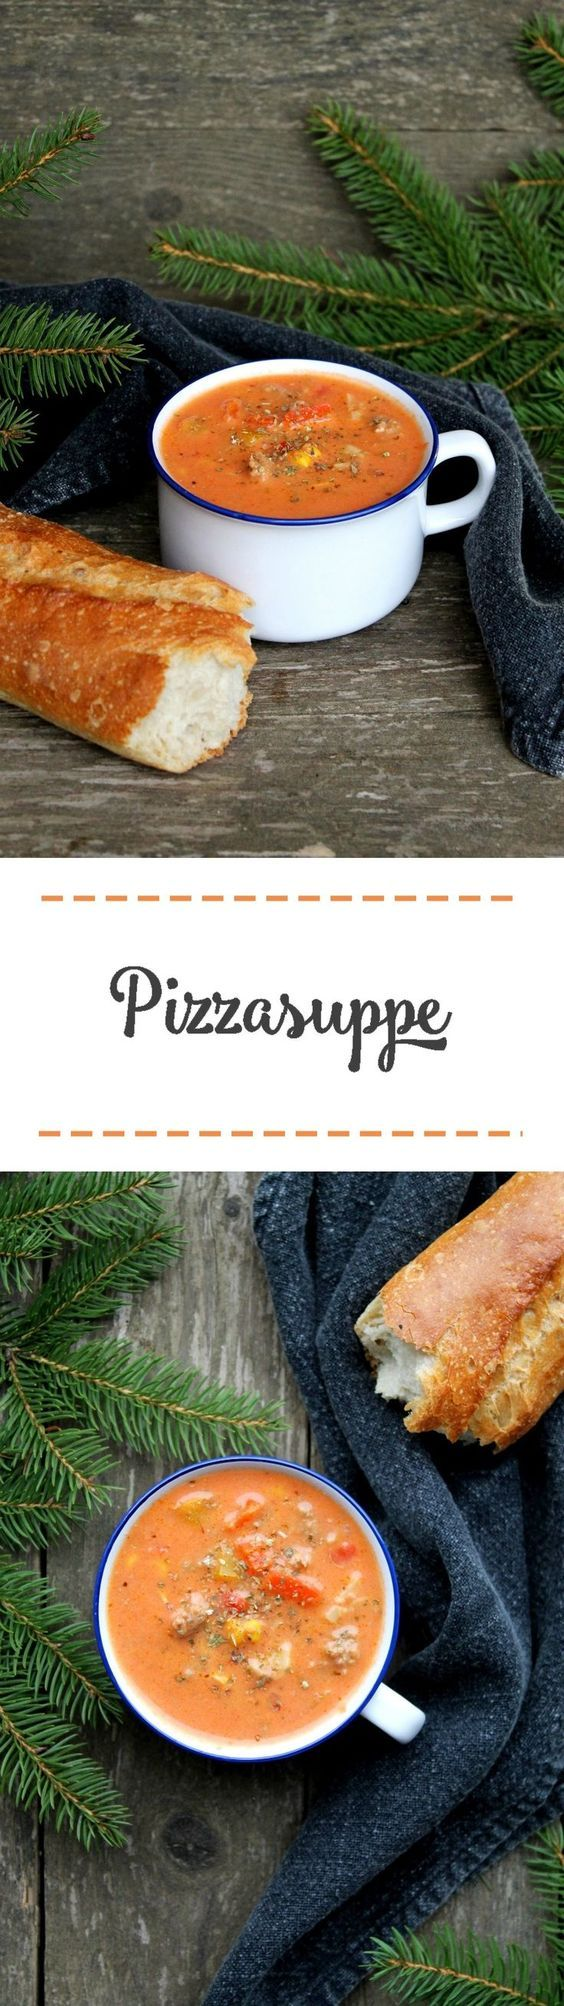 Rezept für Pizzasuppe #foodtips